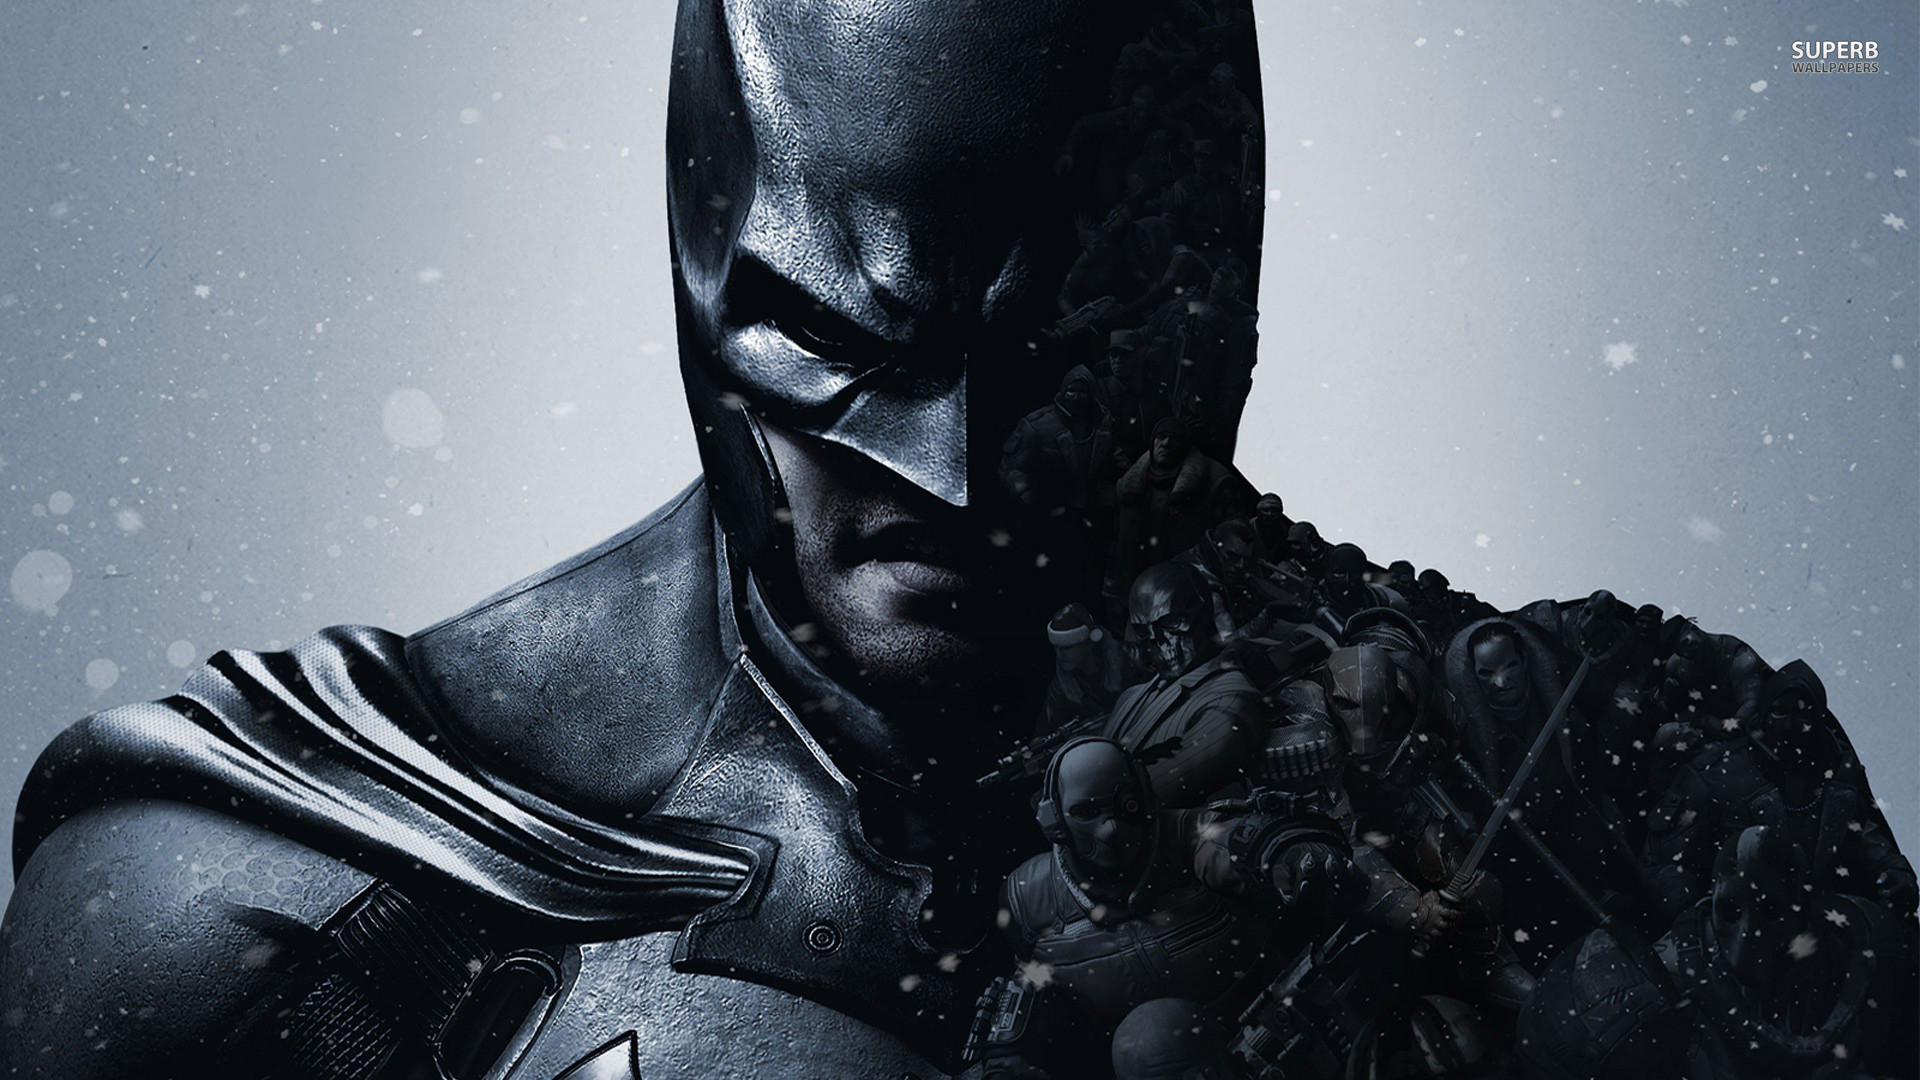 190 Batman: Arkham City HD Wallpapers | Backgrounds – Wallpaper Abyss |  Images Wallpapers | Pinterest | Batman arkham city, Arkham city and City  wallpaper